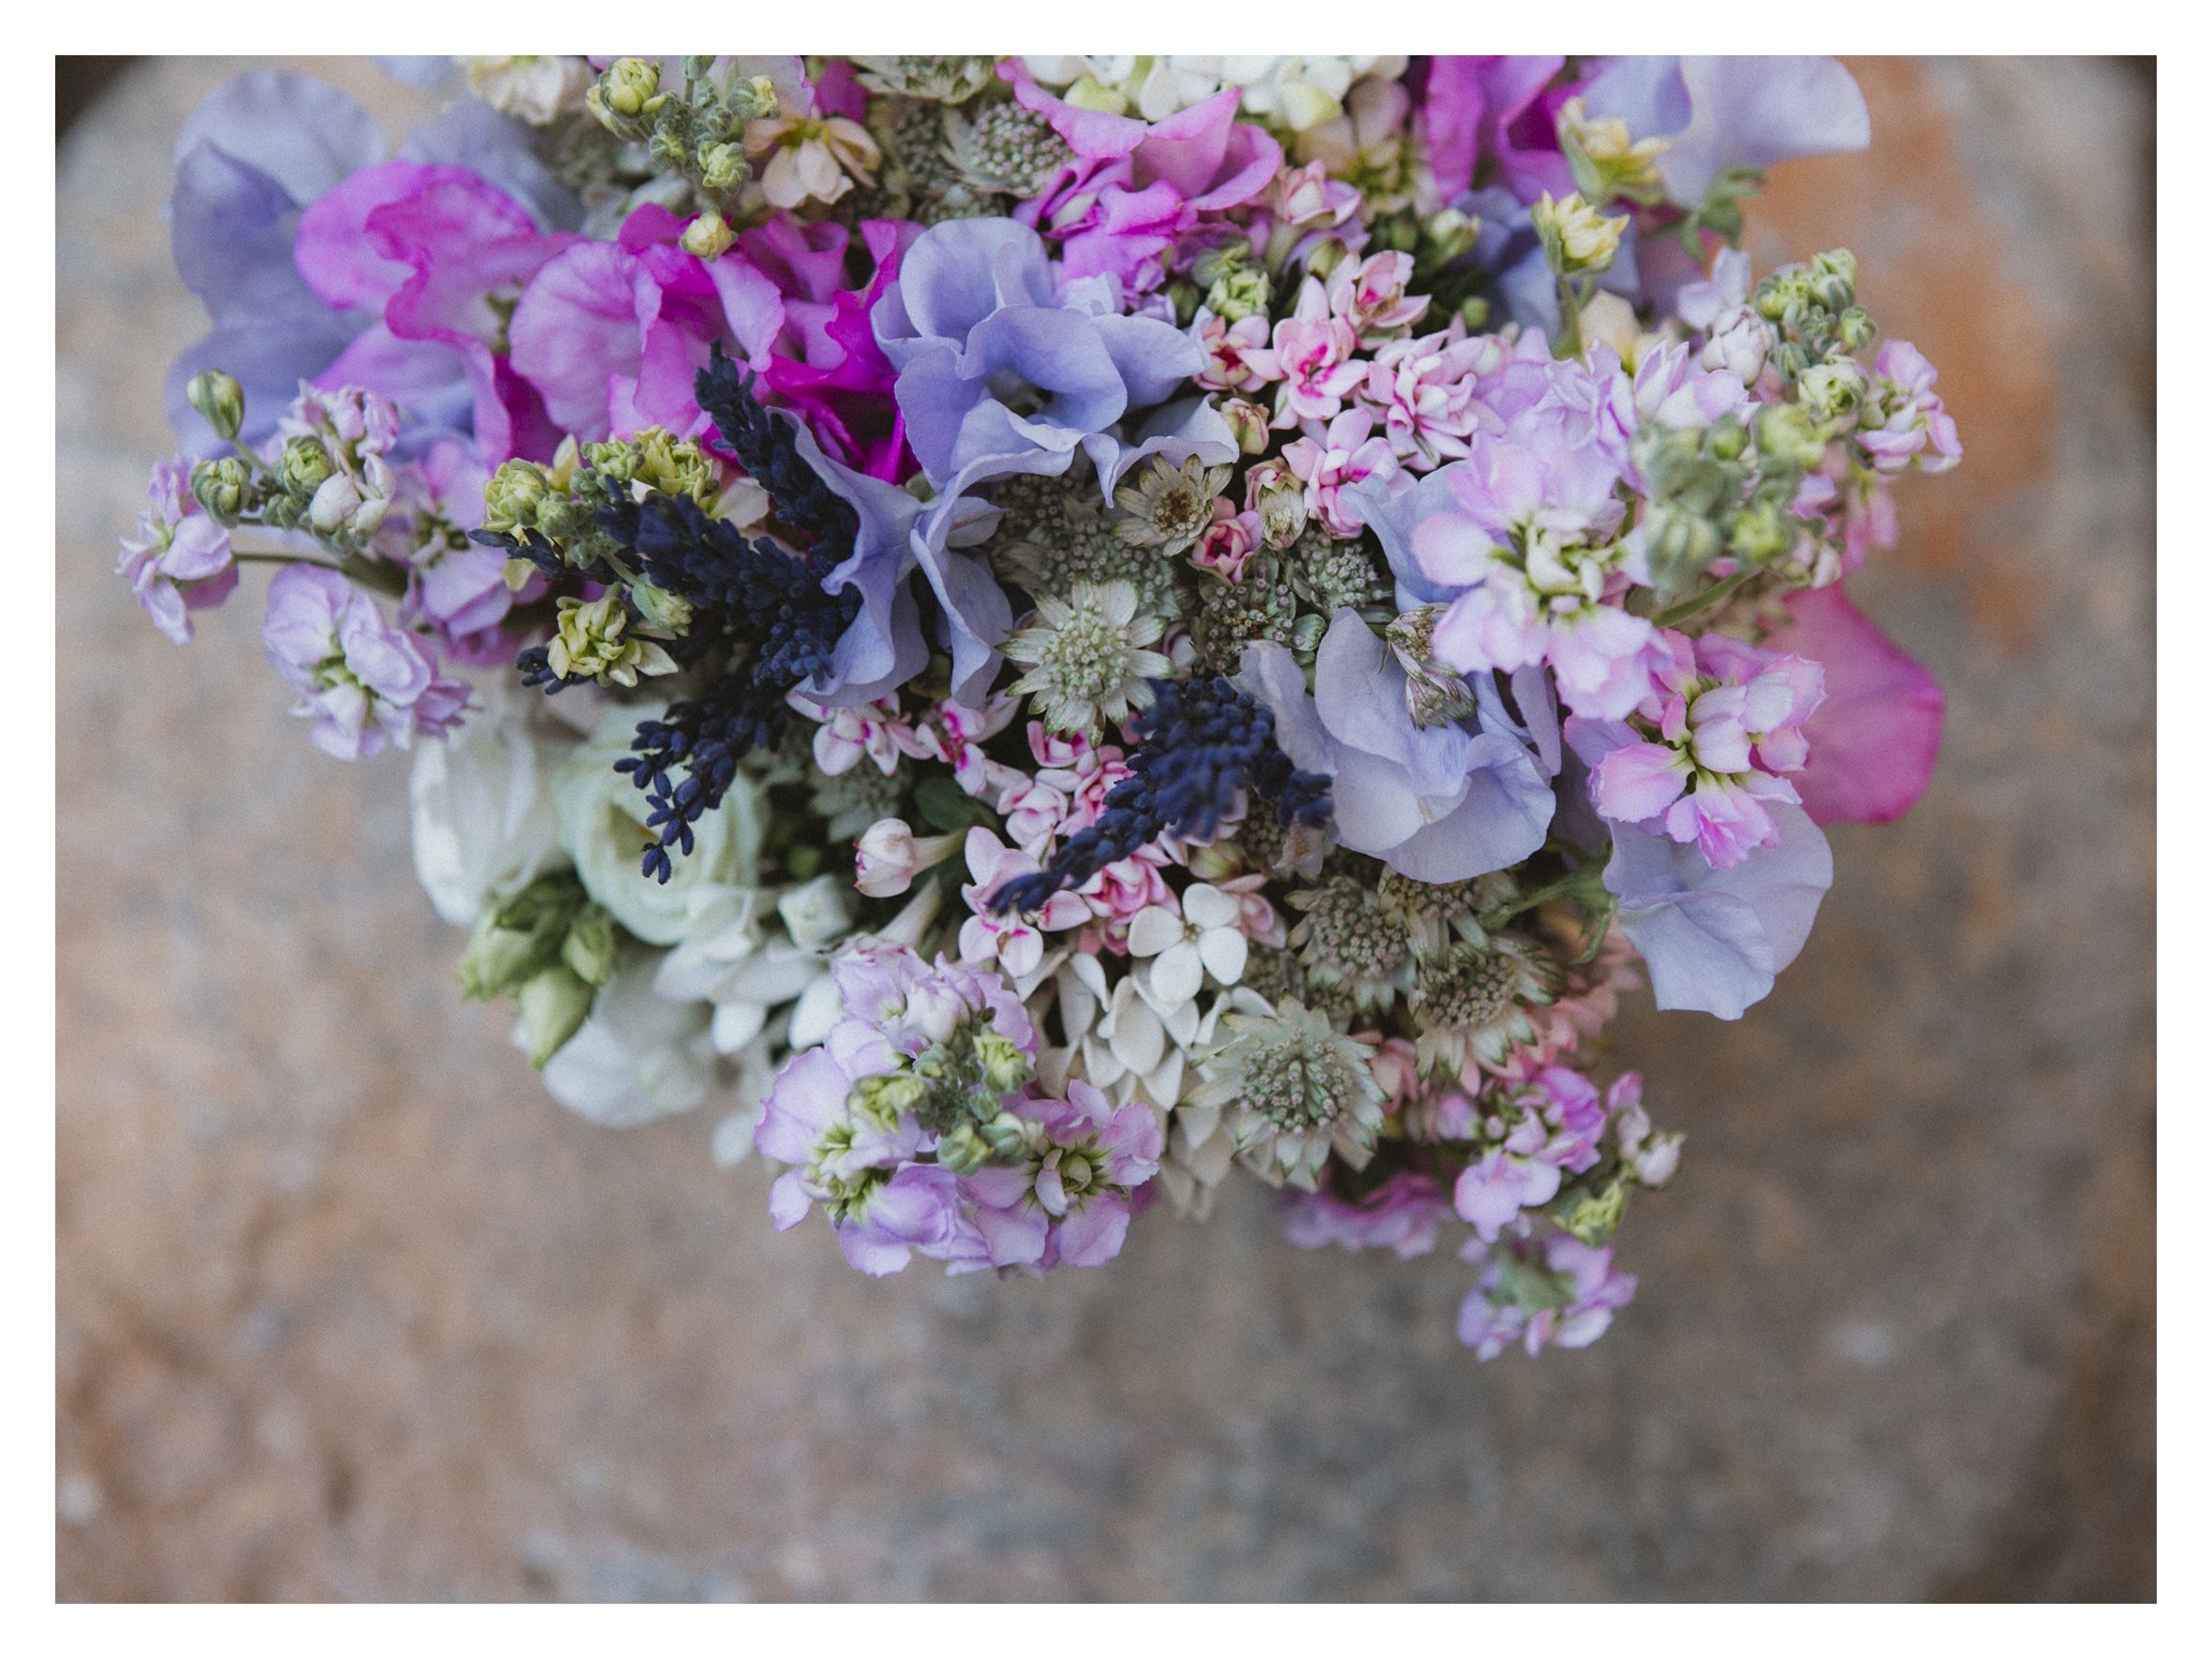 Ramo de novia violeta #ramo #bouquet #novia #bride #lila #morado #violeta